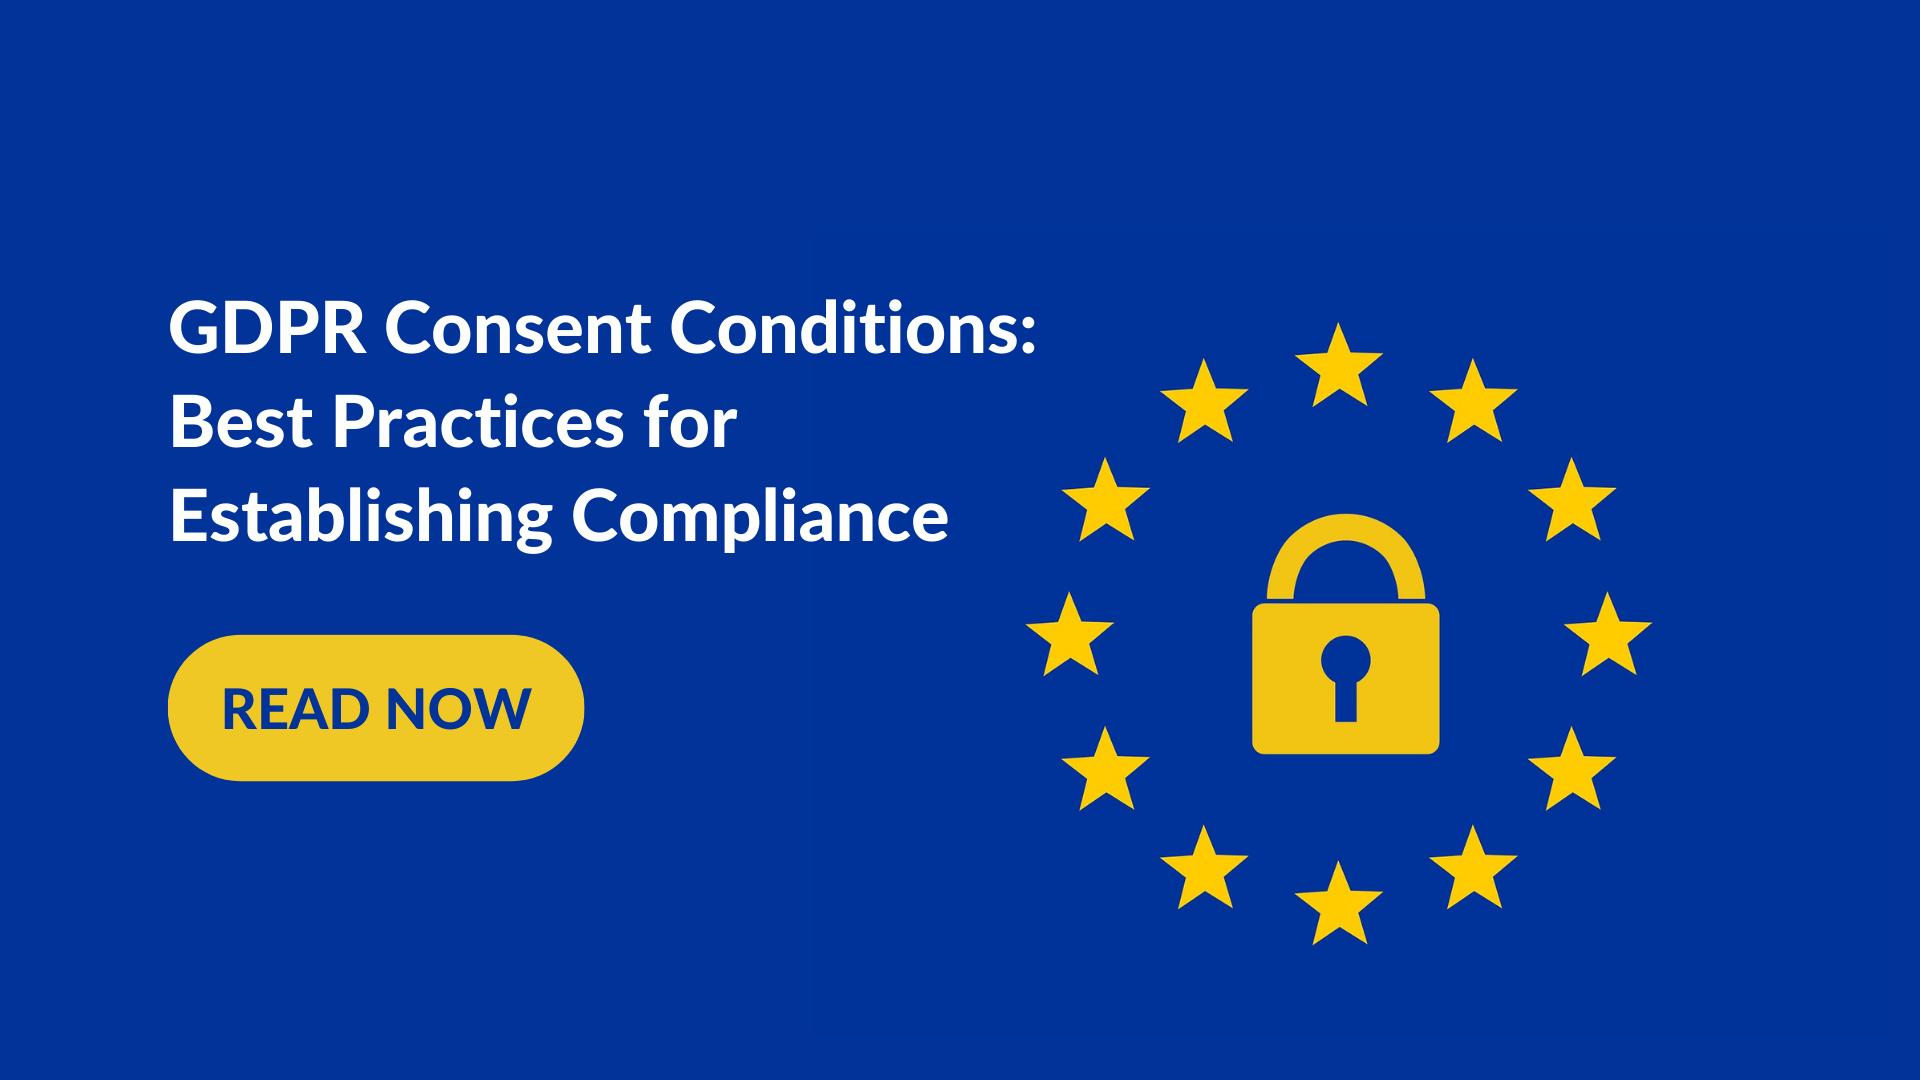 GDPR Consent Management: Best Practices for Establishing Compliance